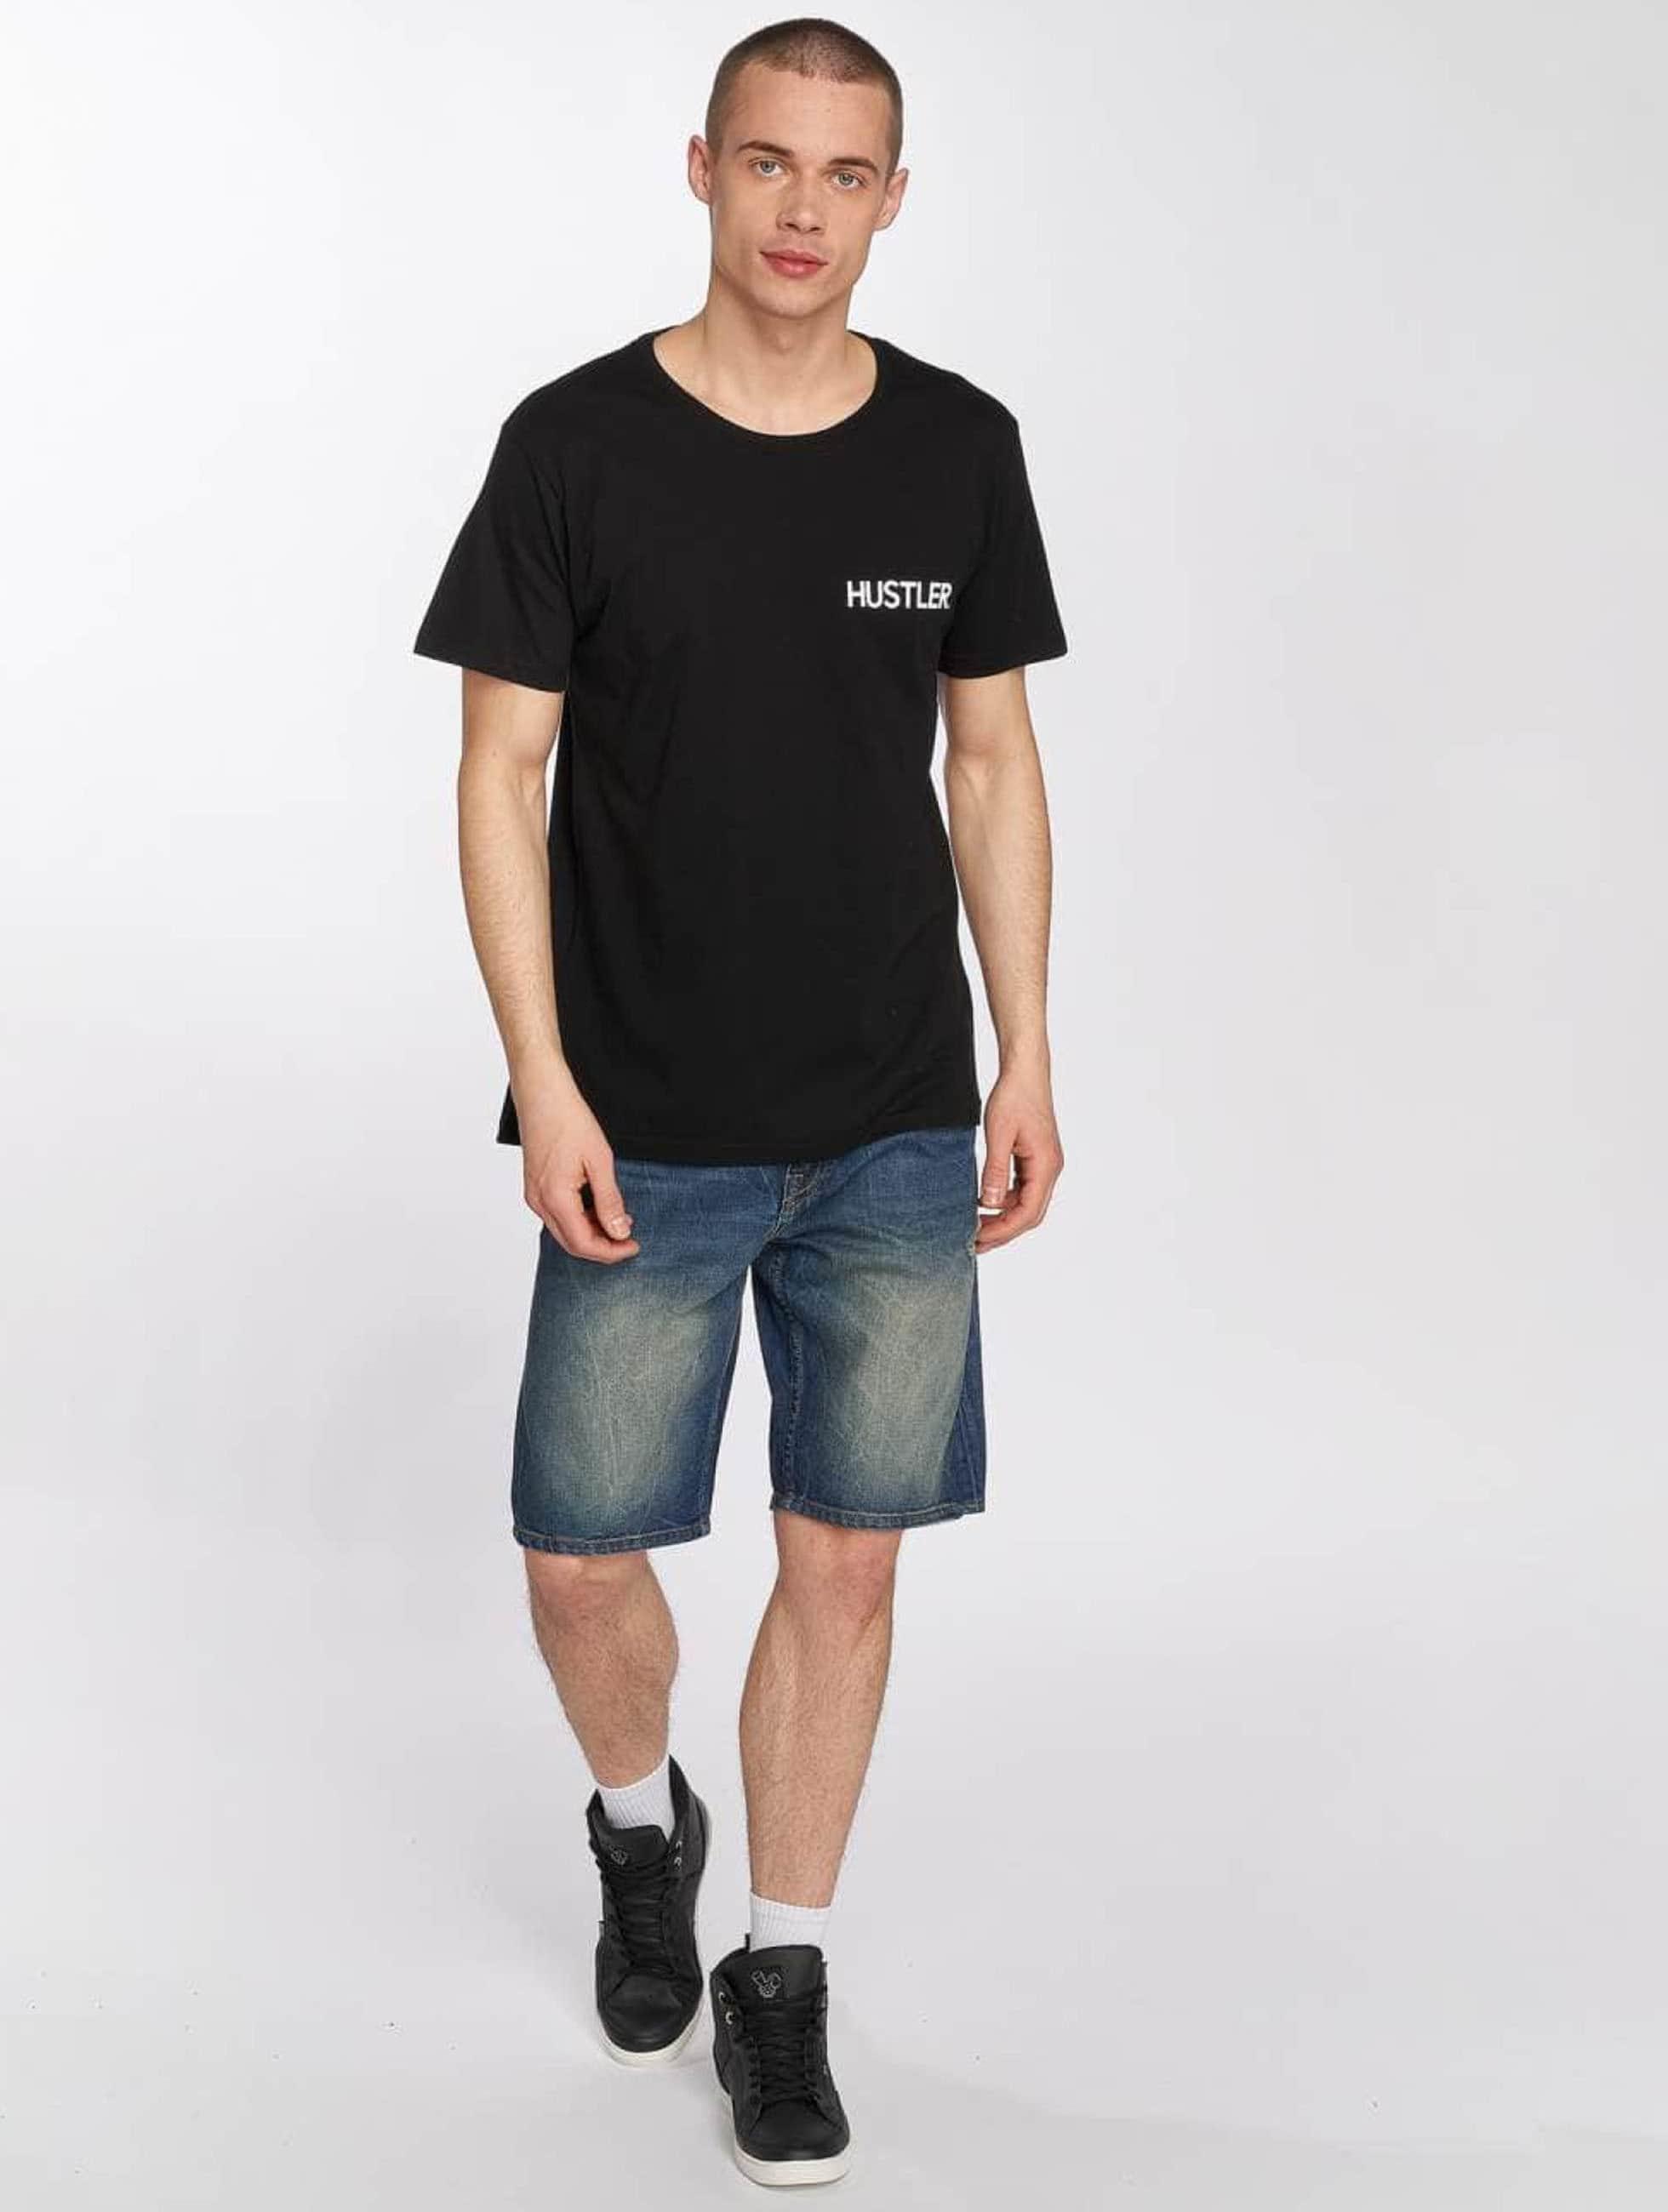 Merchcode T-shirt Hustler Afterparty nero